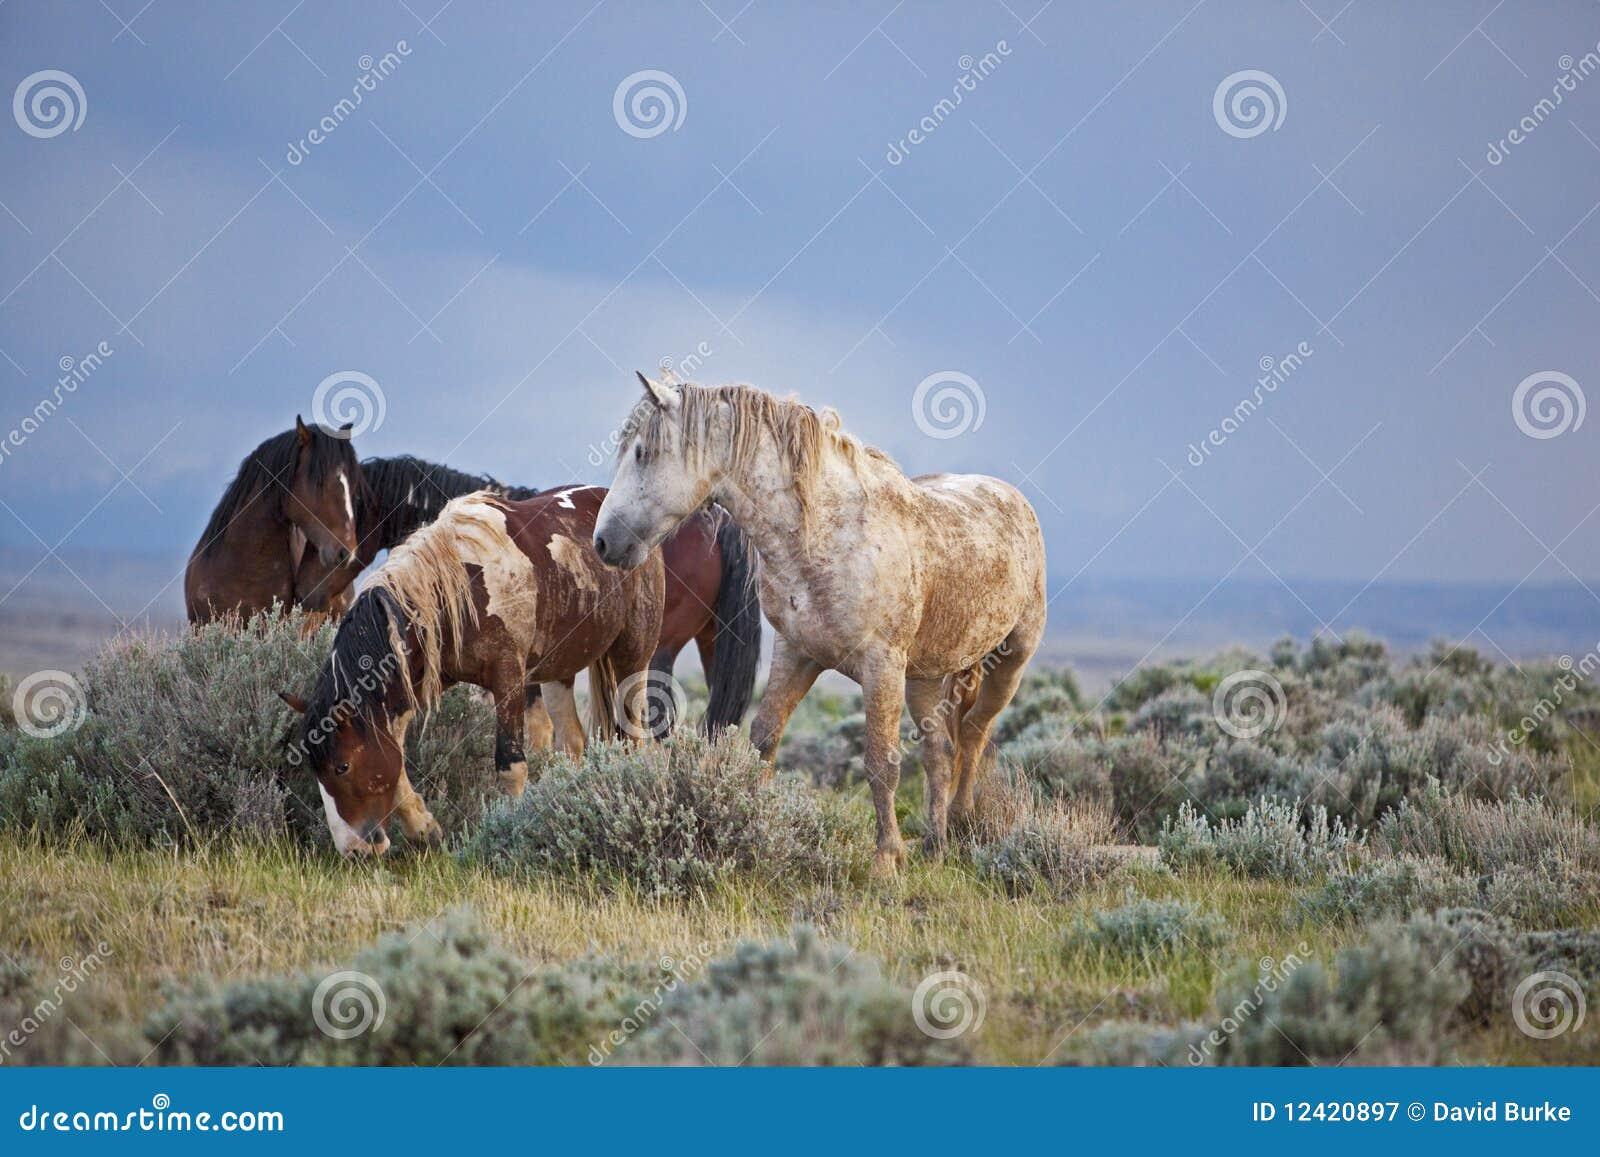 Mustangos después de la lluvia